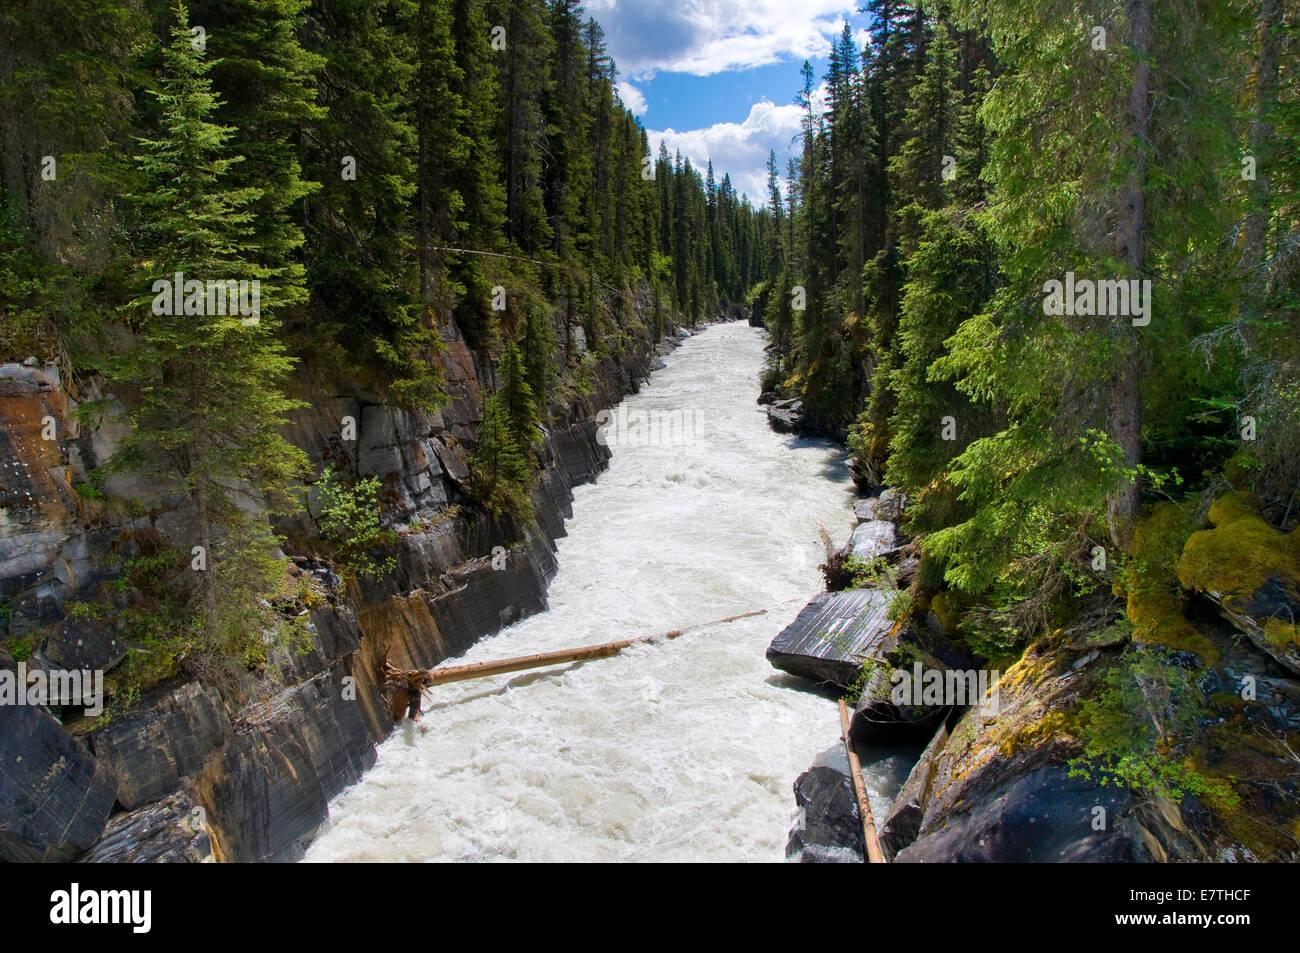 Wallpaper Of Water Fall Numa Falls Kootenay National Park British Columbia